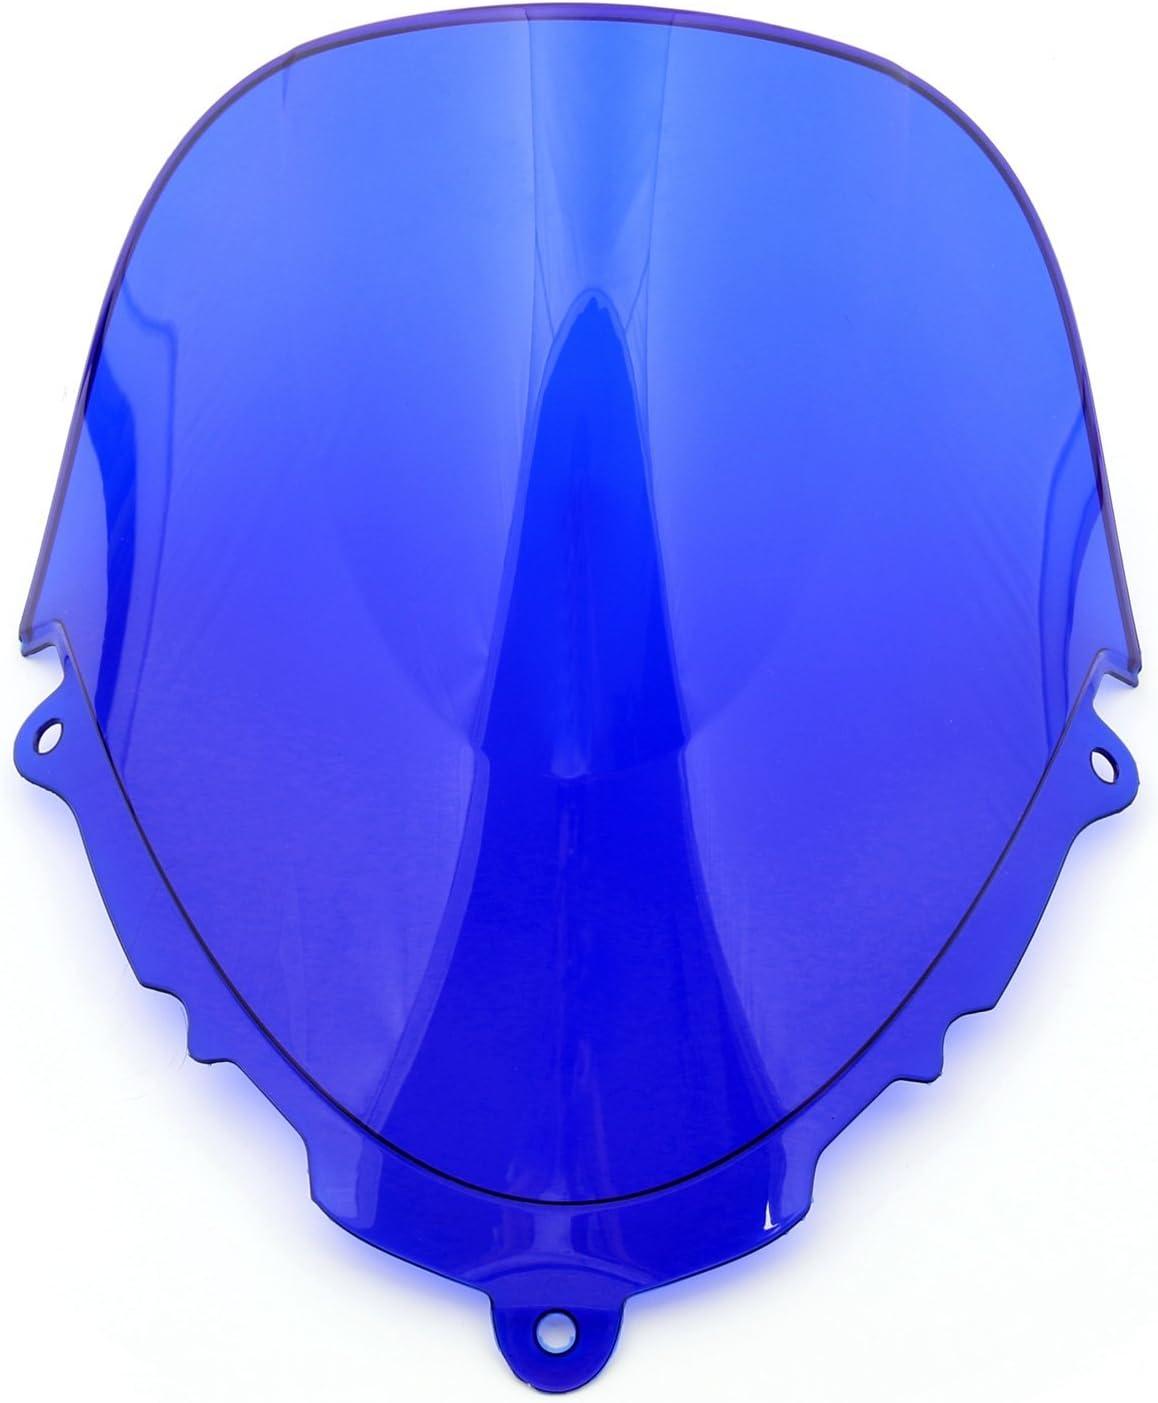 Areyourshop Windscreen Windshield for Suzuki GSX 600 750 F Katana 1998-2008